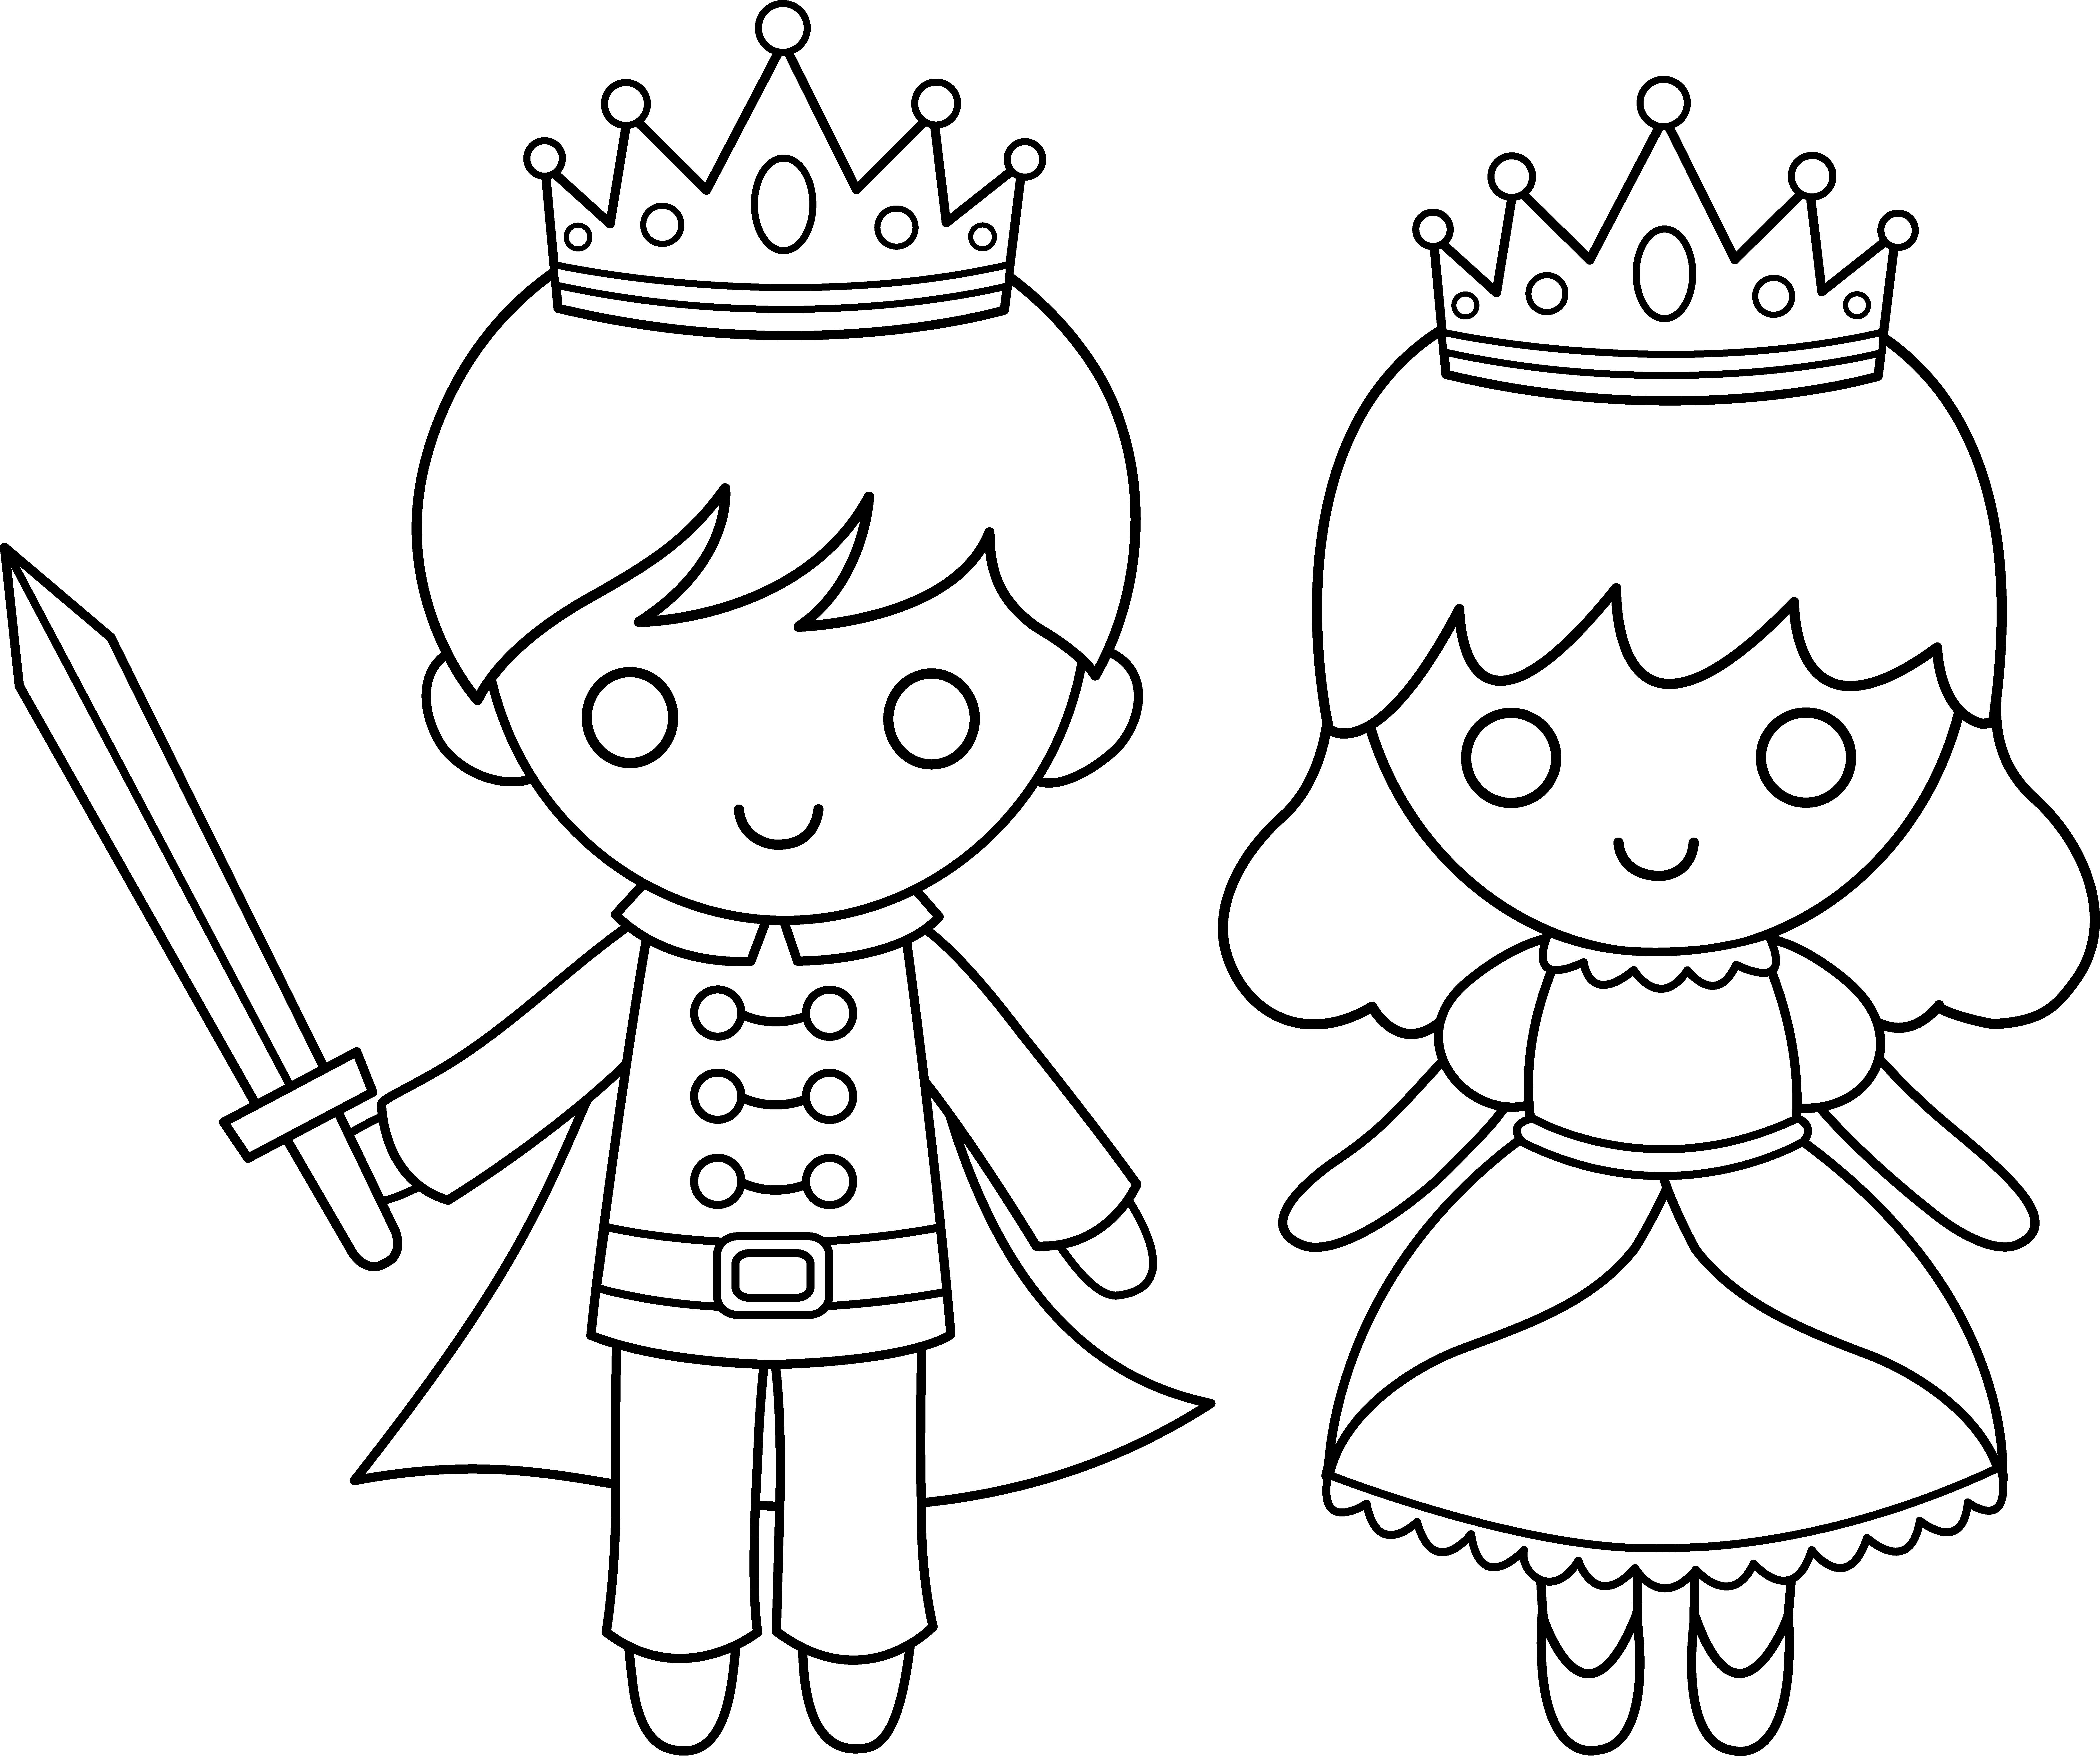 Princess clipart outline Art Free Princess Art Prince